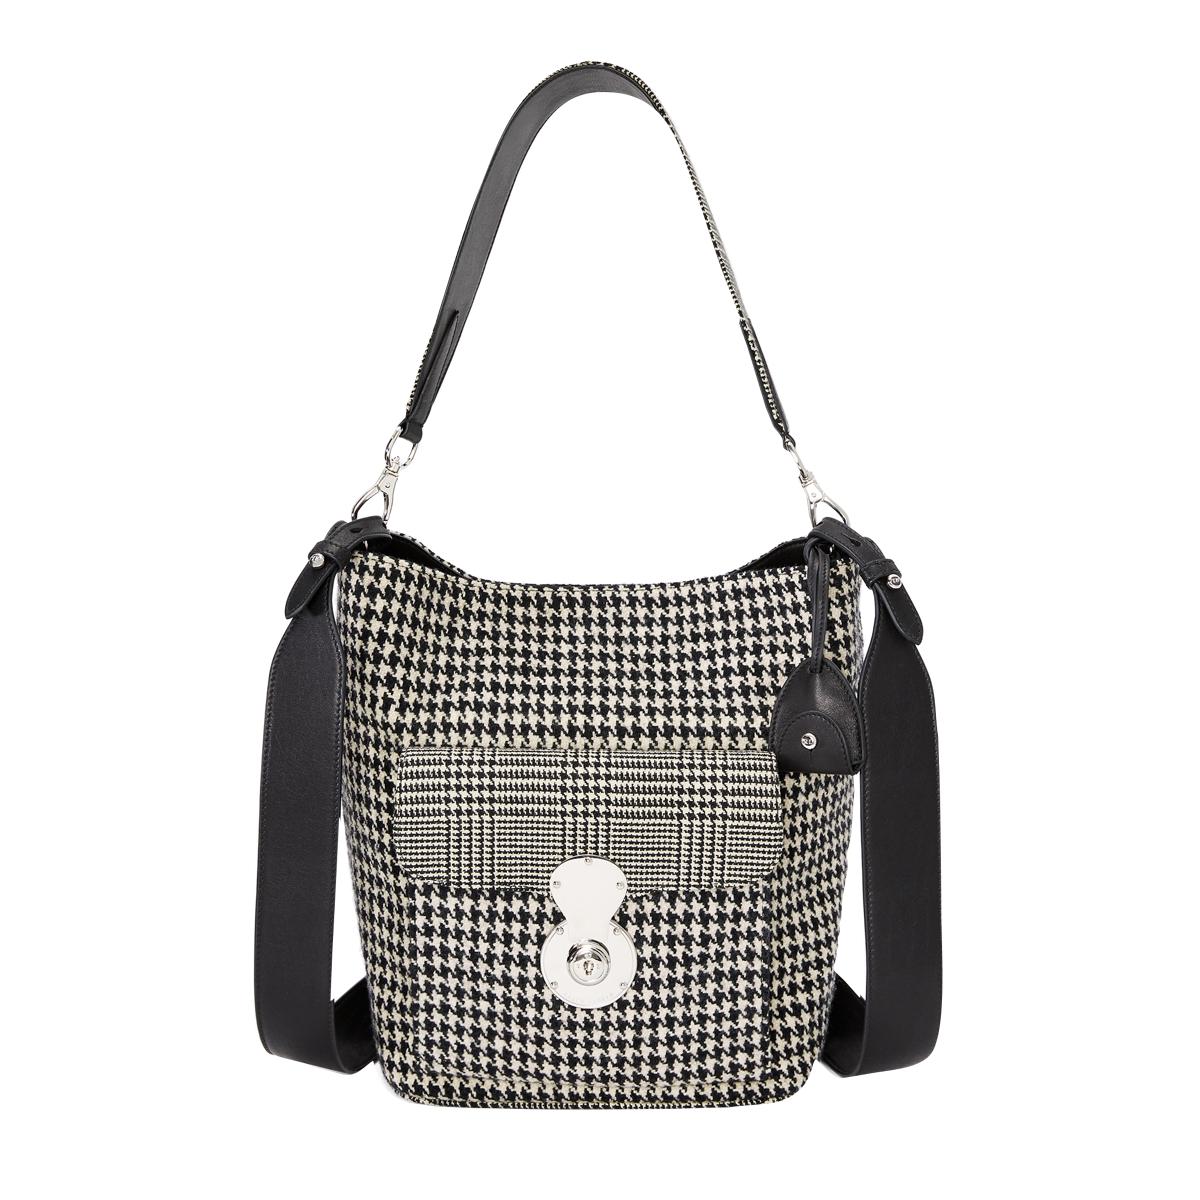 5030ec405295 The Houndstooth RL Bucket Bag